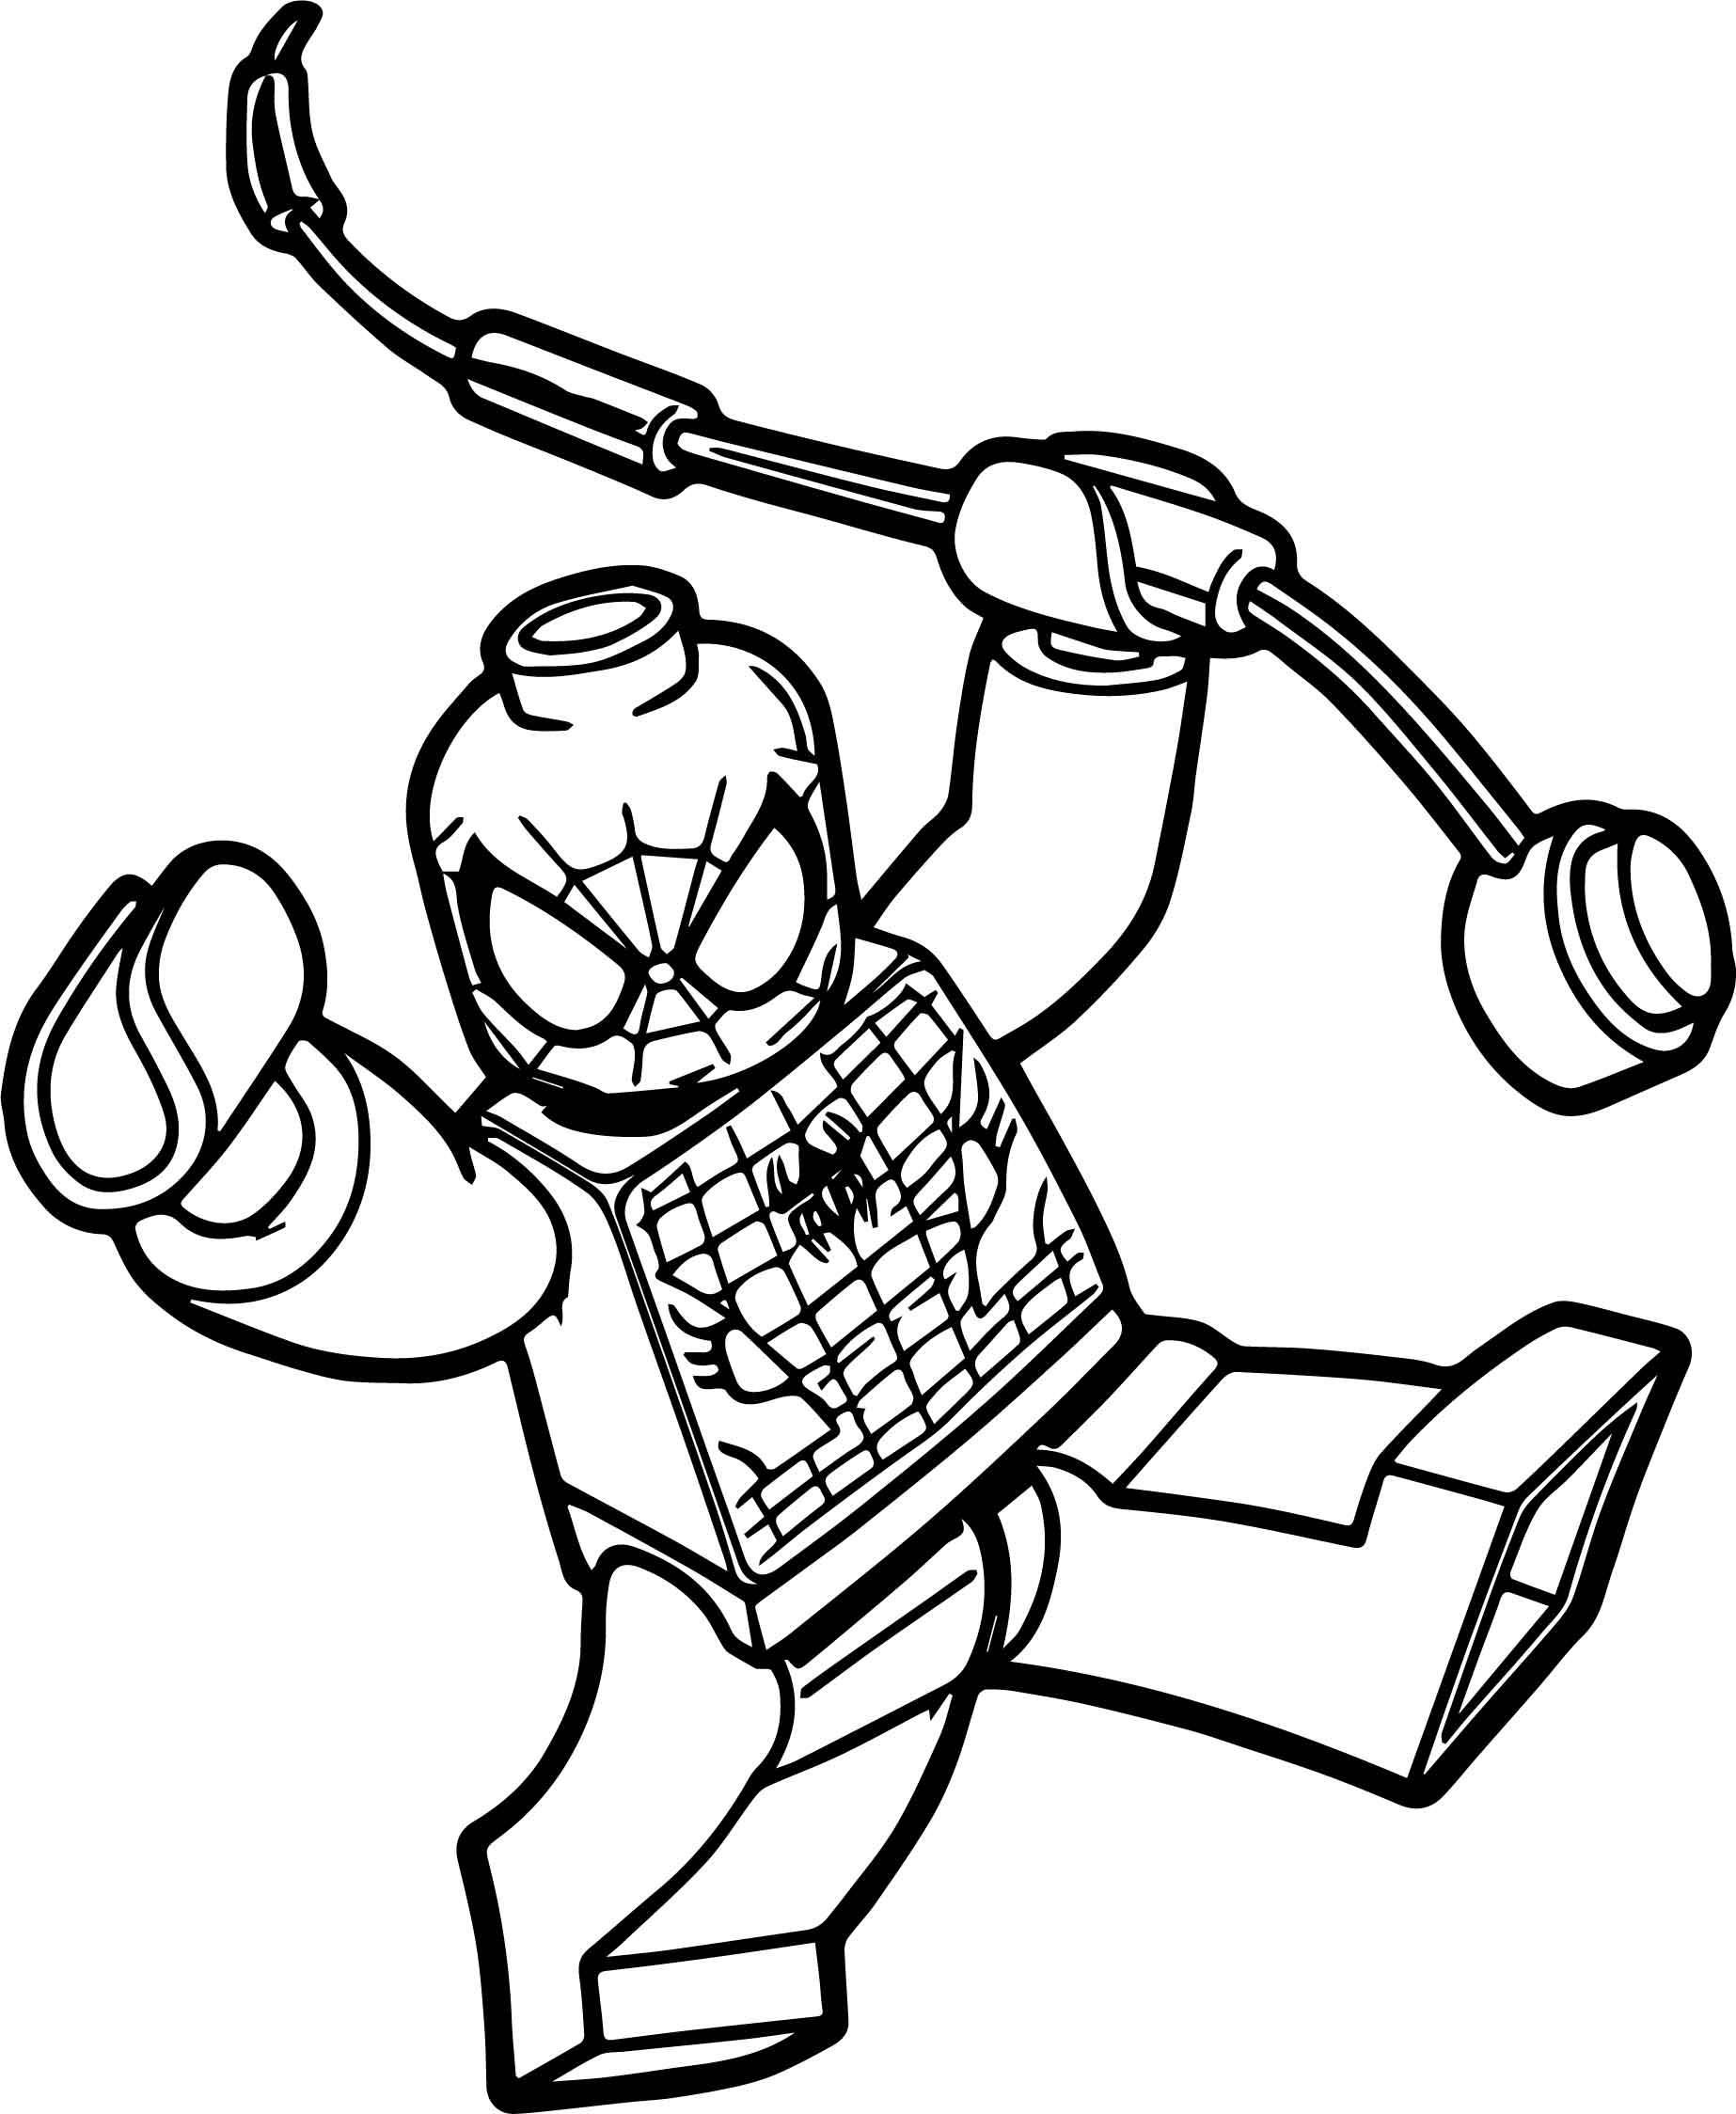 Box Spiderman Lego Spider Man Coloring Page Wecoloringpage